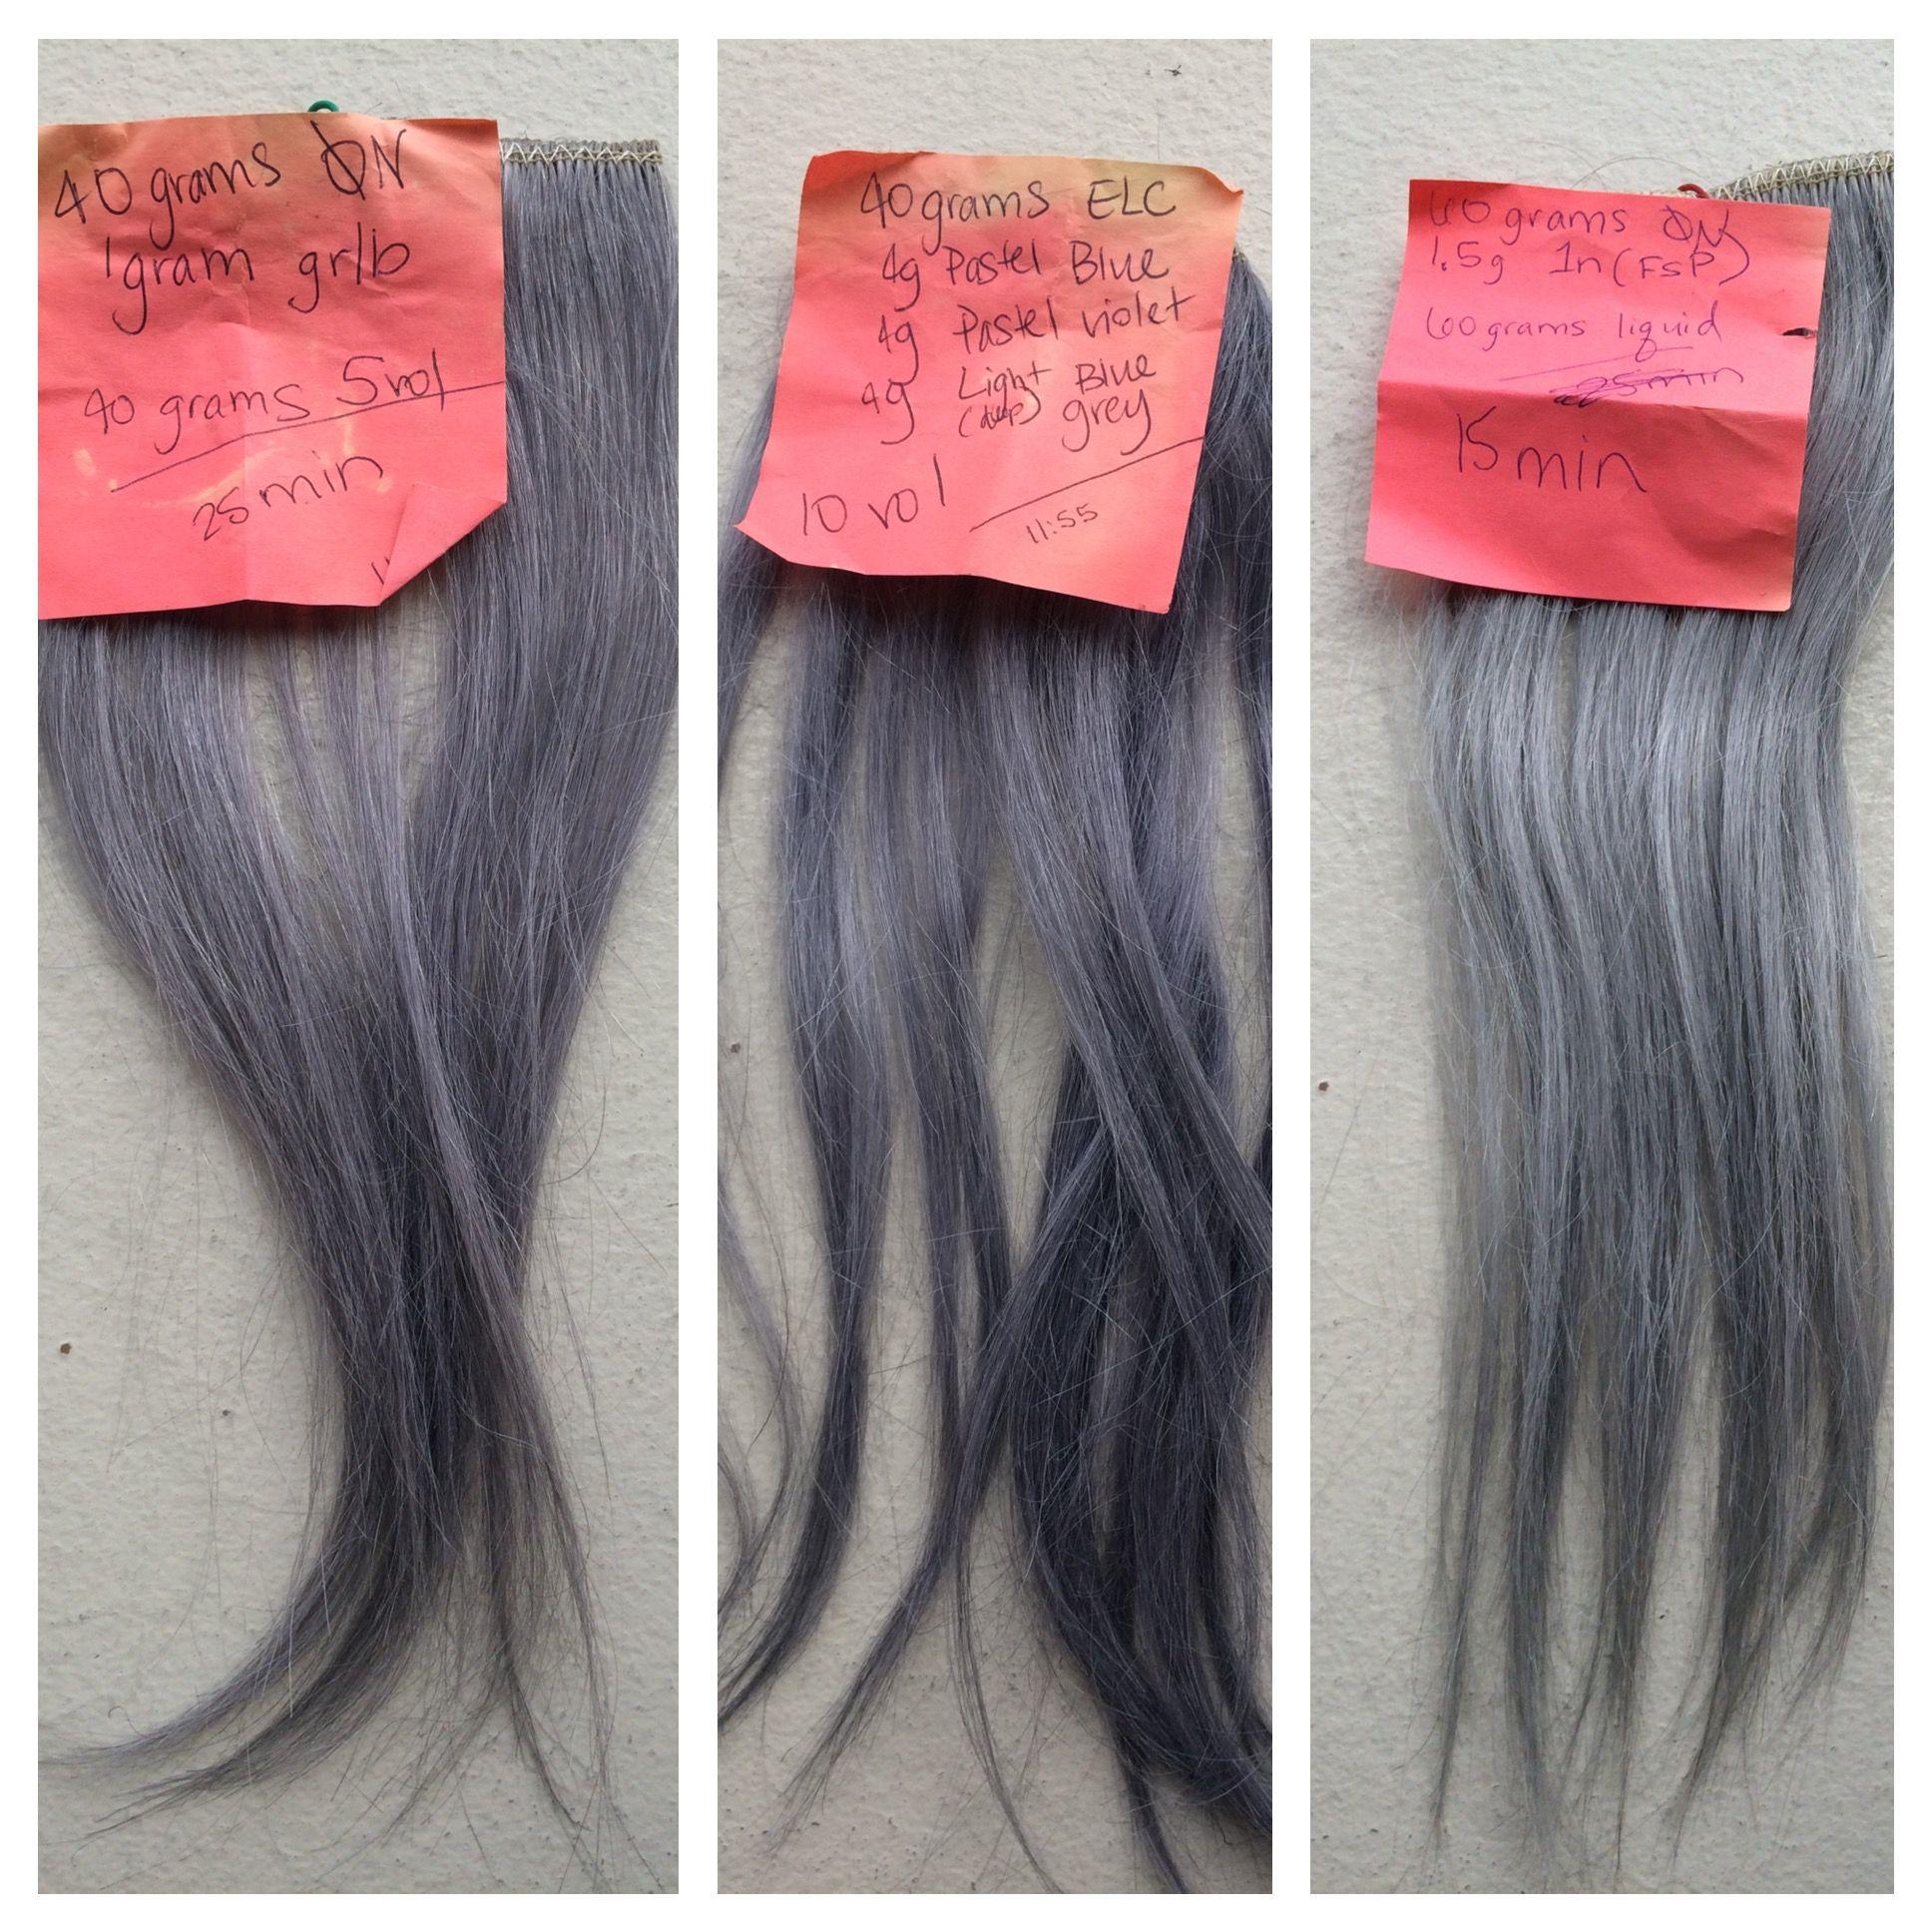 Aveda Gray Hair Color Formulas Done On Blonde Hair Wefts Follow Christybruski On Instagram